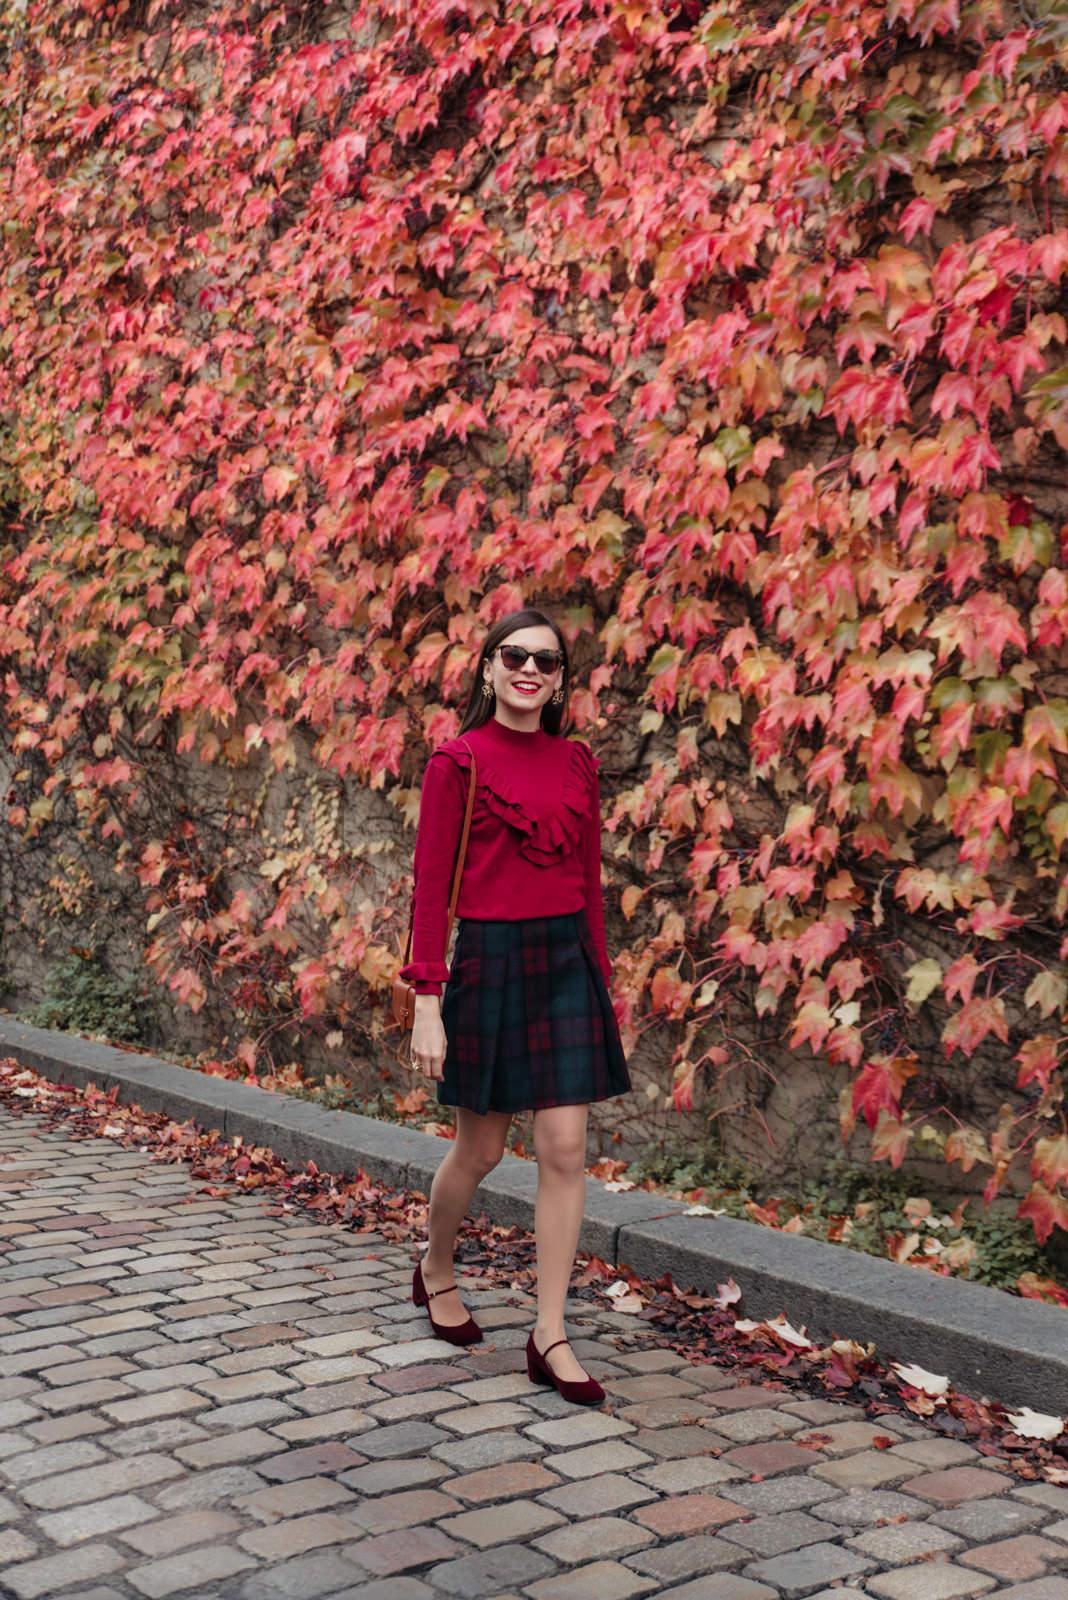 Blog-Mode-And-The-City-Looks-Mur-de-Feuilles-Montmartre-3